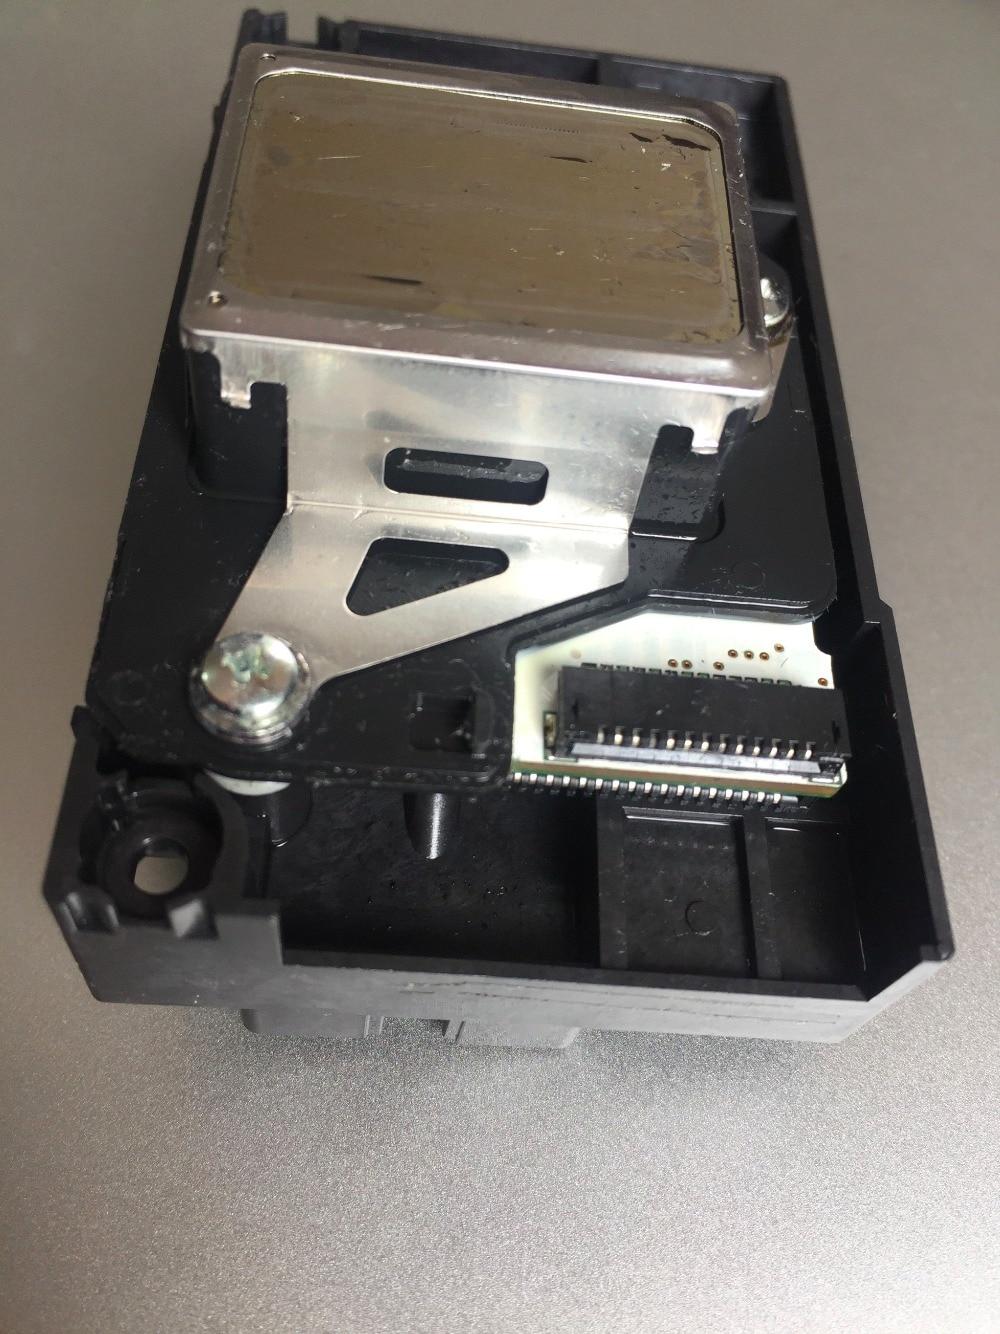 Original print head For EPSON T50 A50 P50 P60 A60 T59 T60 Printer Head----F180000 free shipping for epson l800 t50 r290 t60 p50 printer head for epson f180000 original head page 3